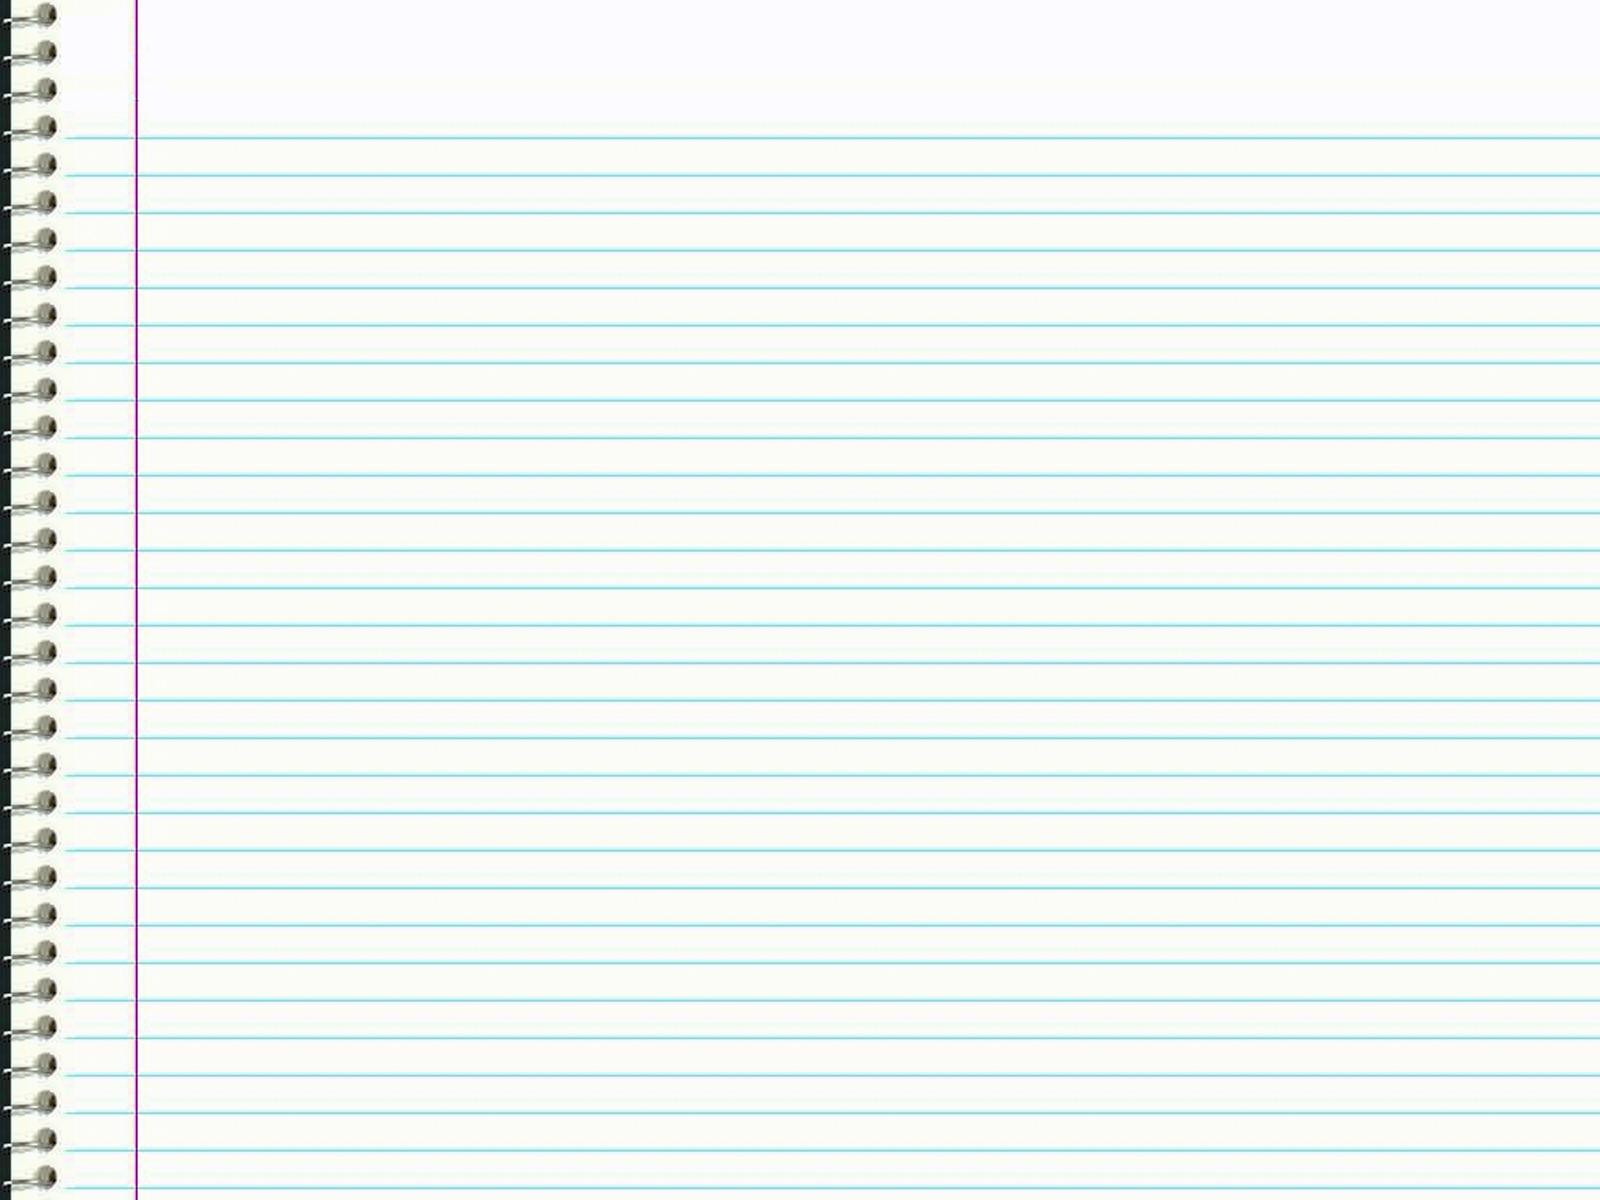 Notebook Paper Design PPT Backgrounds